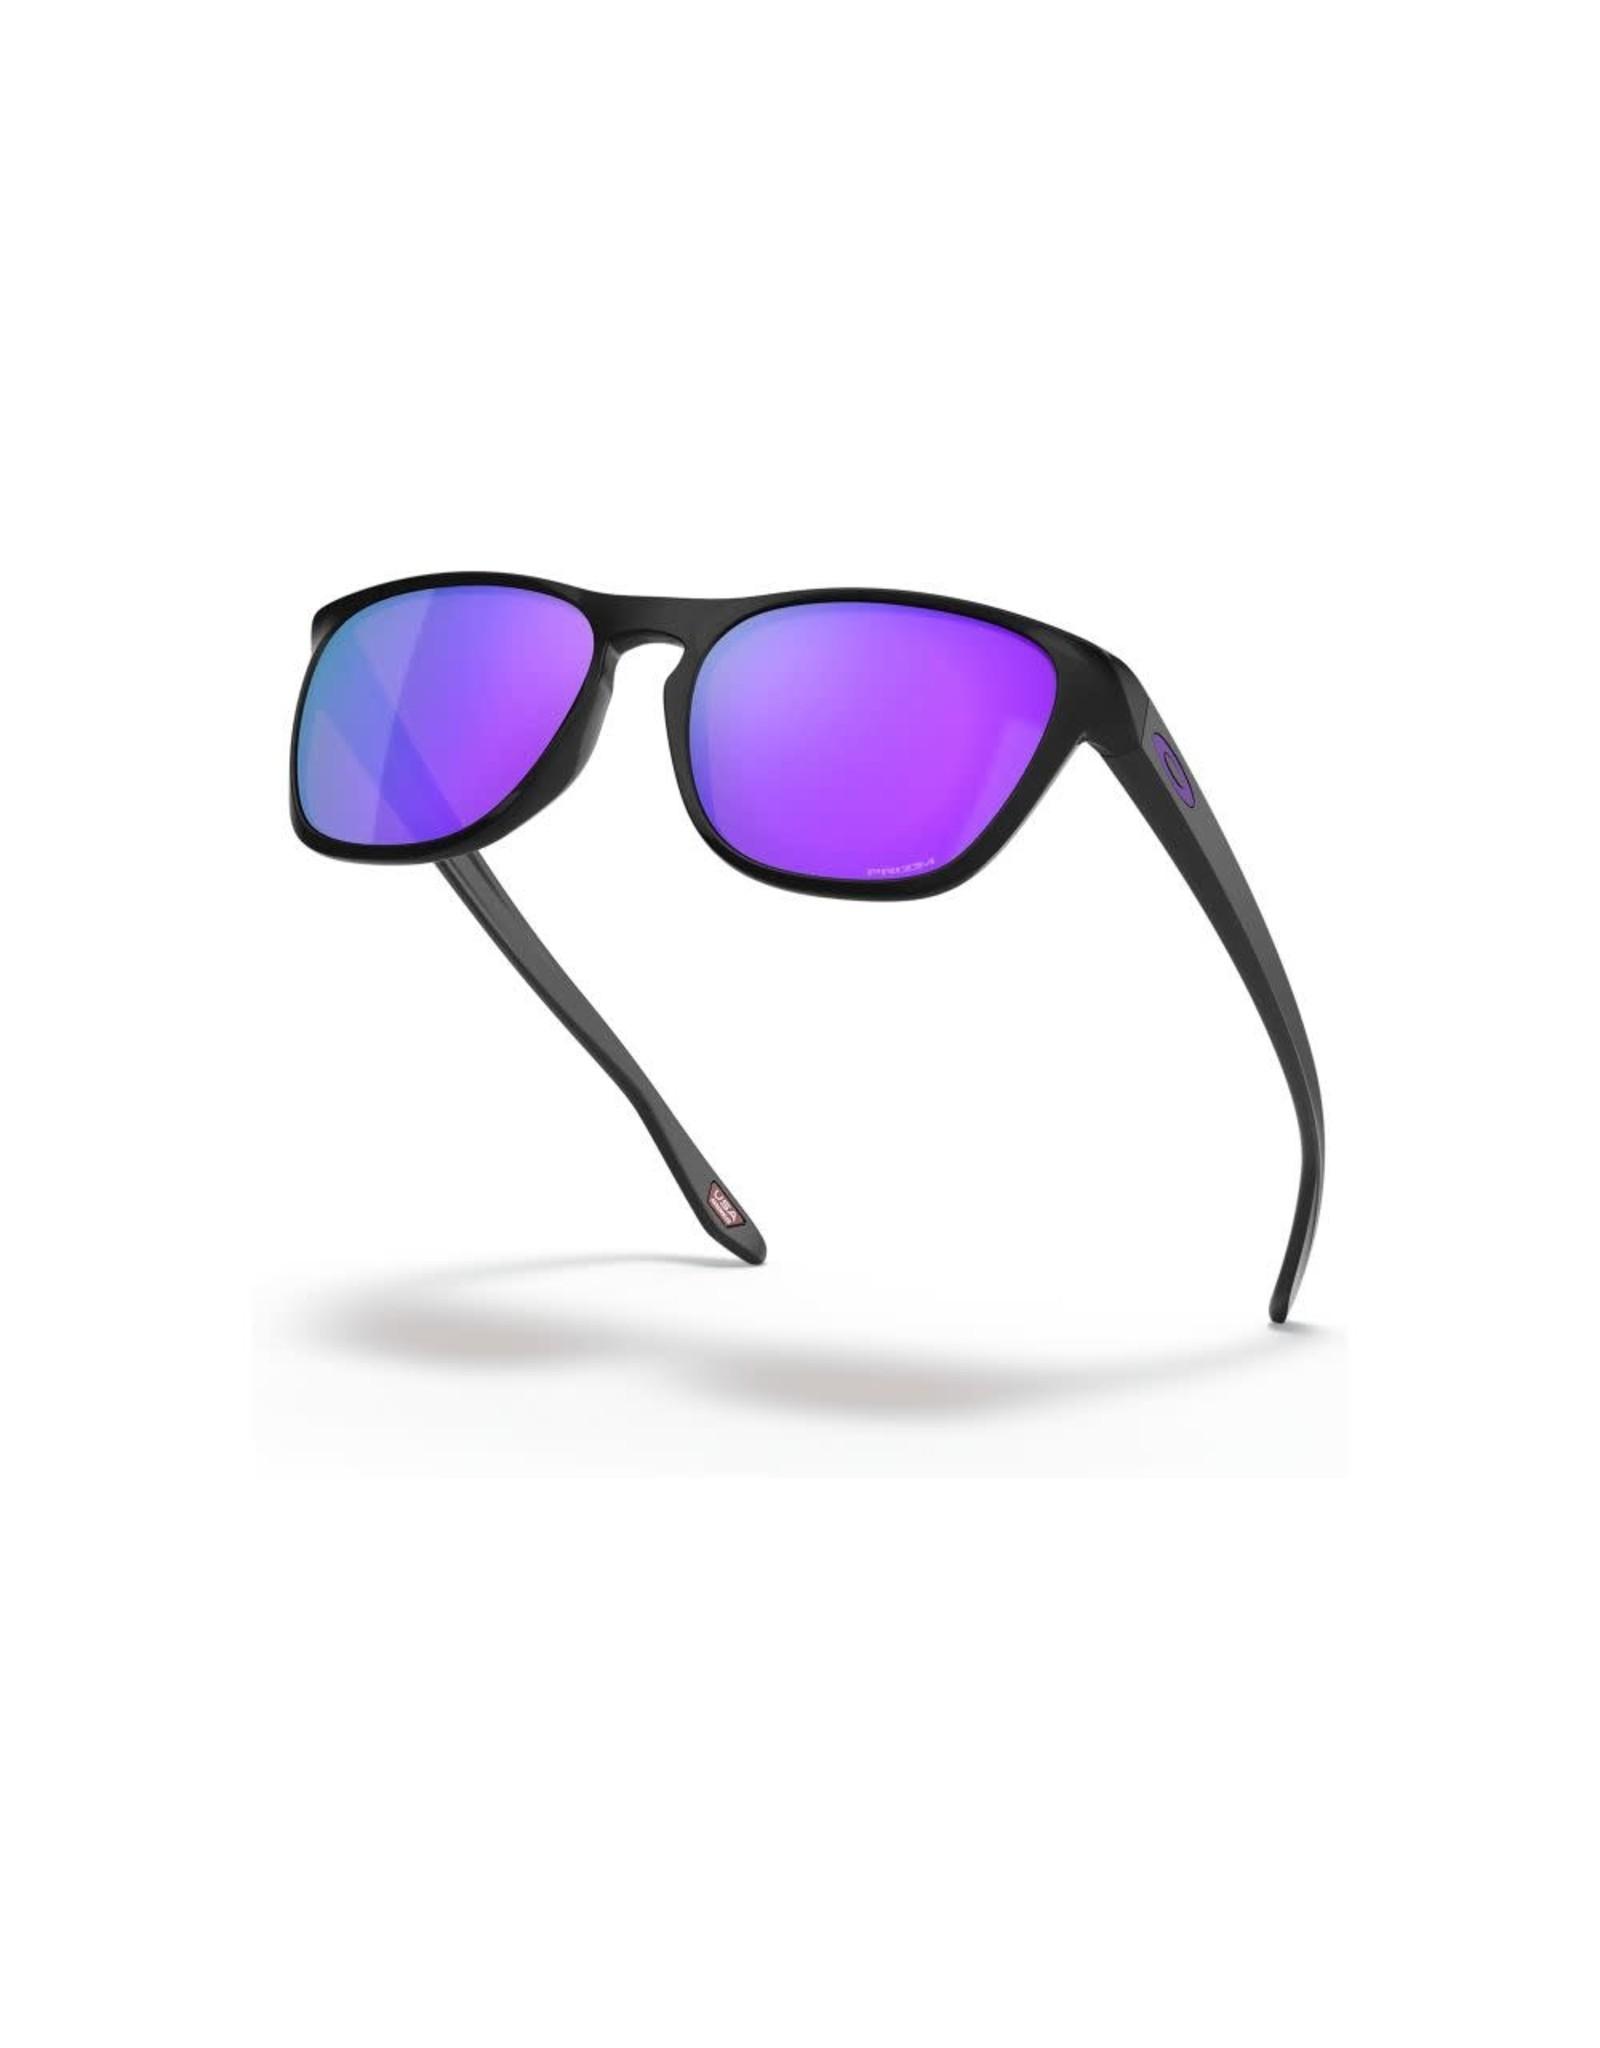 OAKLEY Oakley Manorburn matte black prizm violet sunglasses